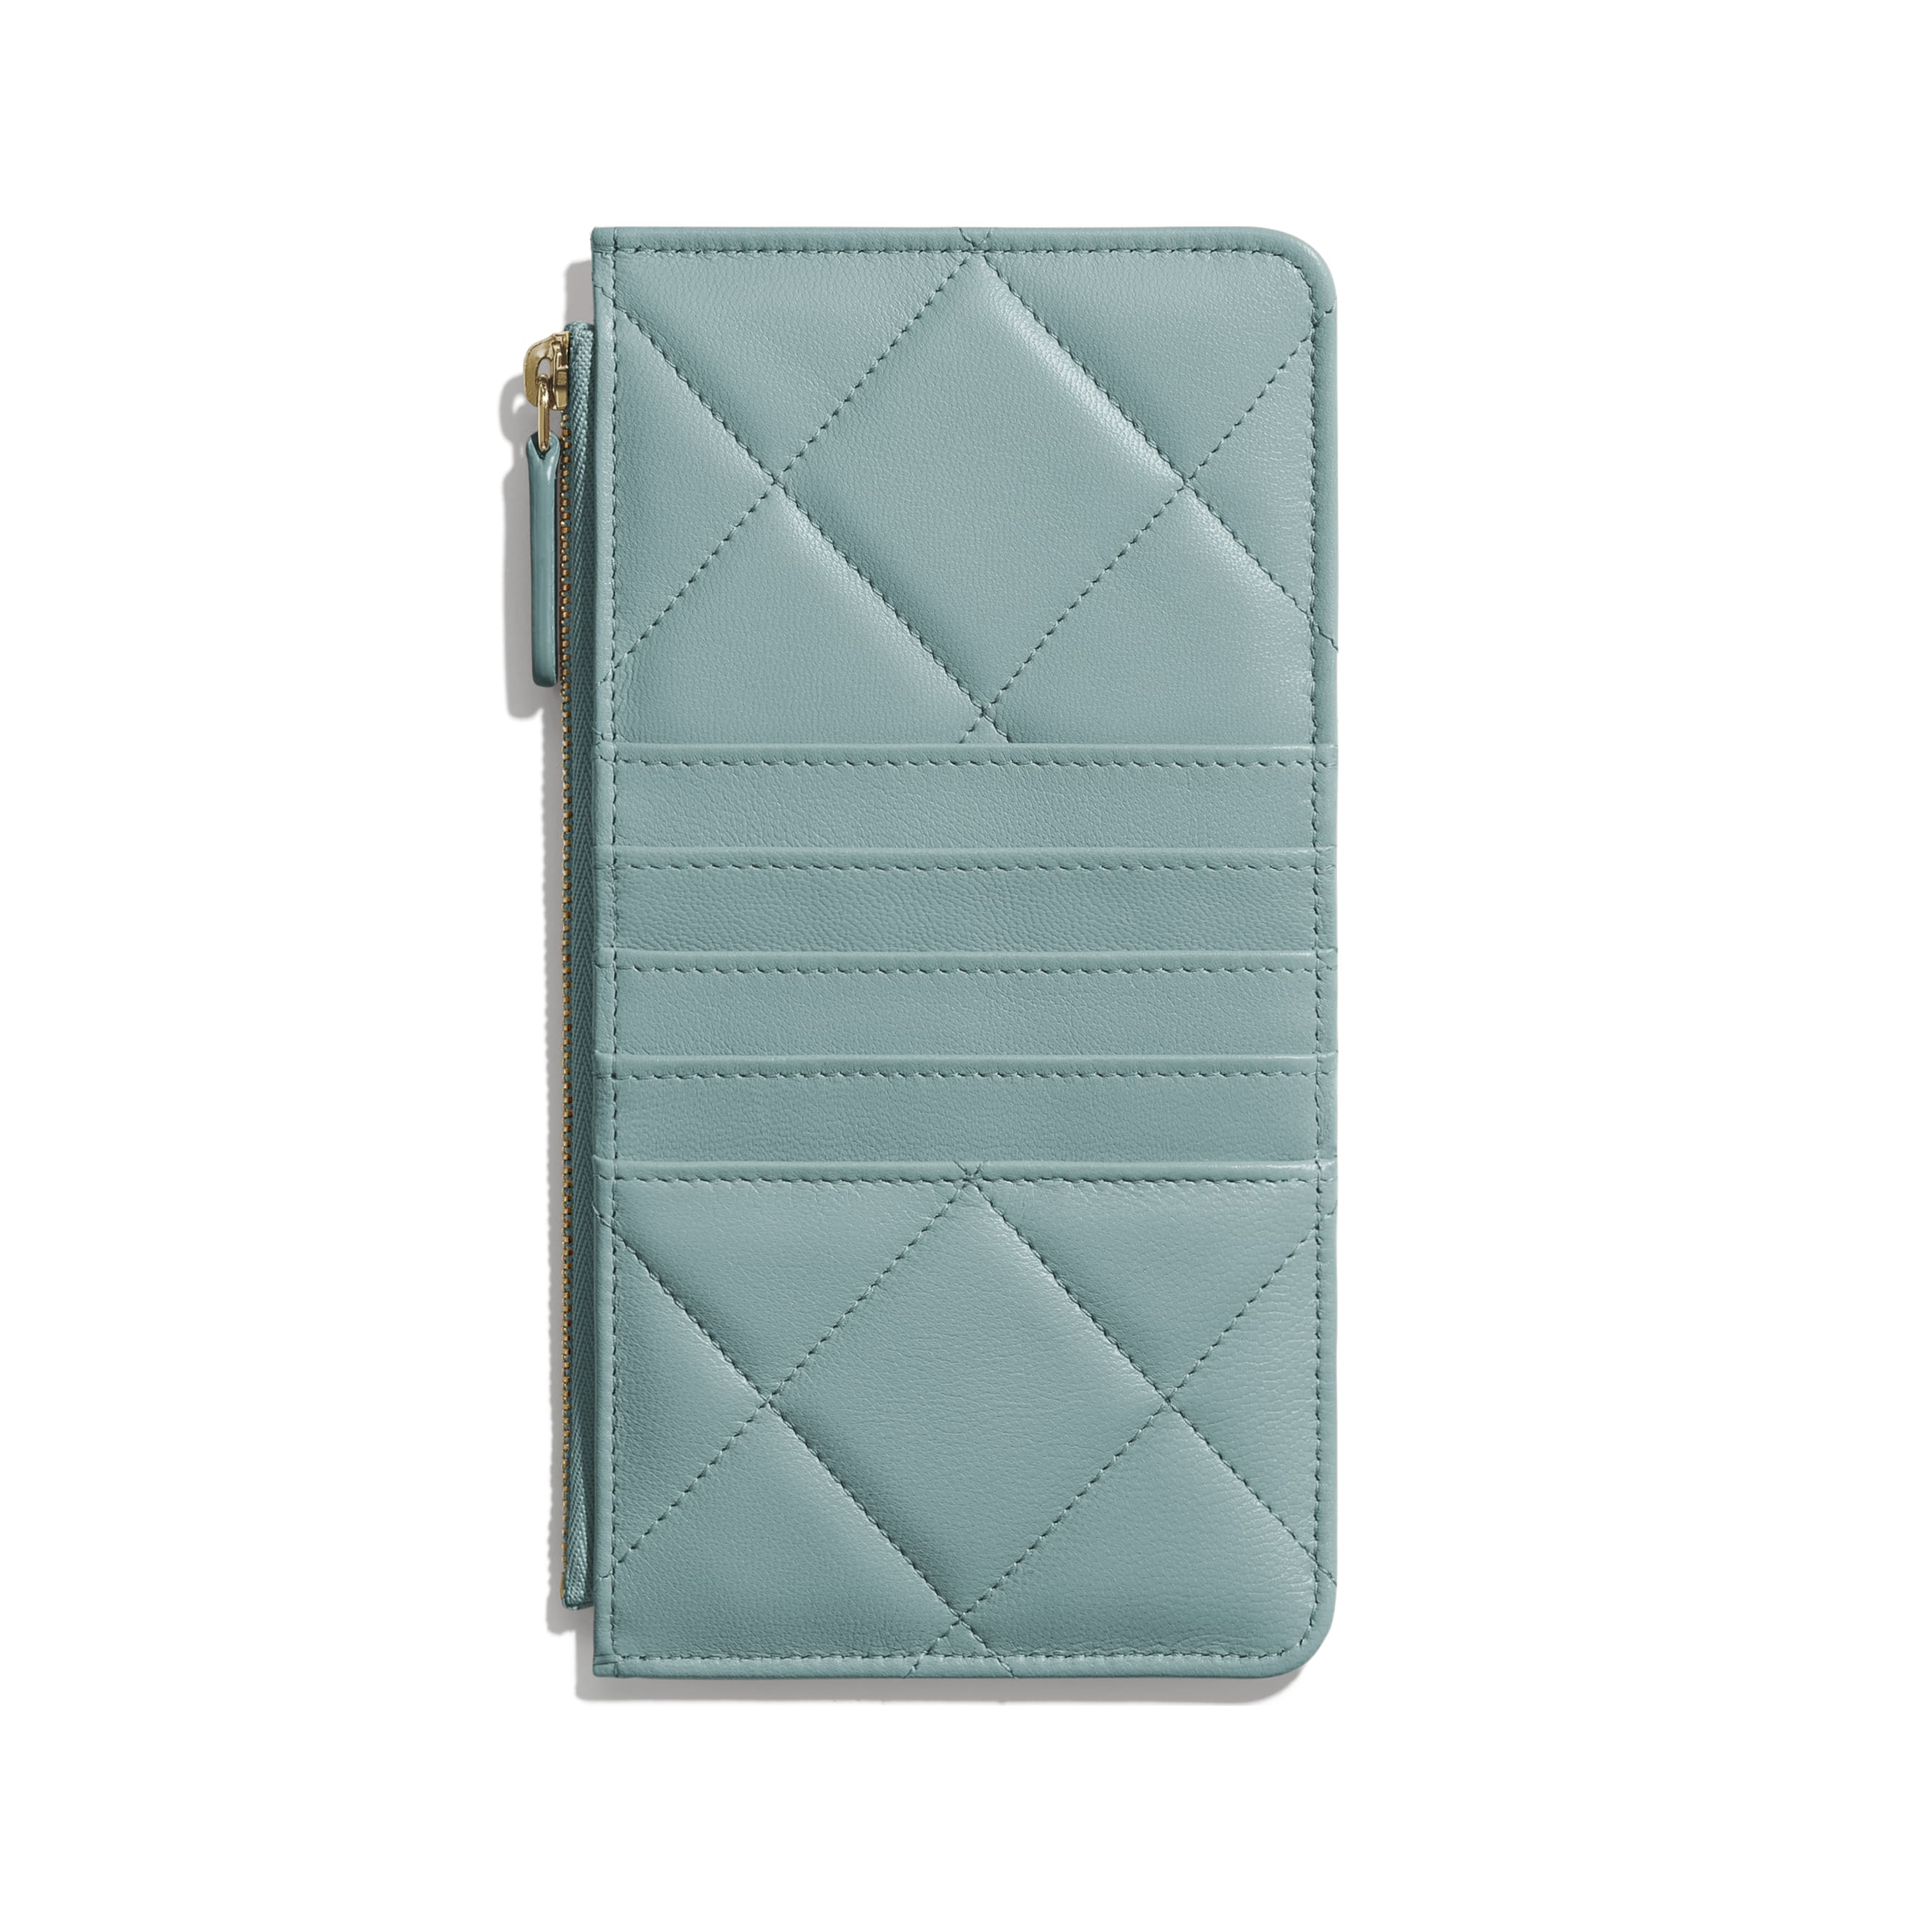 CHANEL 19 Phone & Card Holder - Blue - Shiny Goatskin, Gold-Tone, Silver-Tone & Ruthenium-Finish Metal - Alternative view - see standard sized version